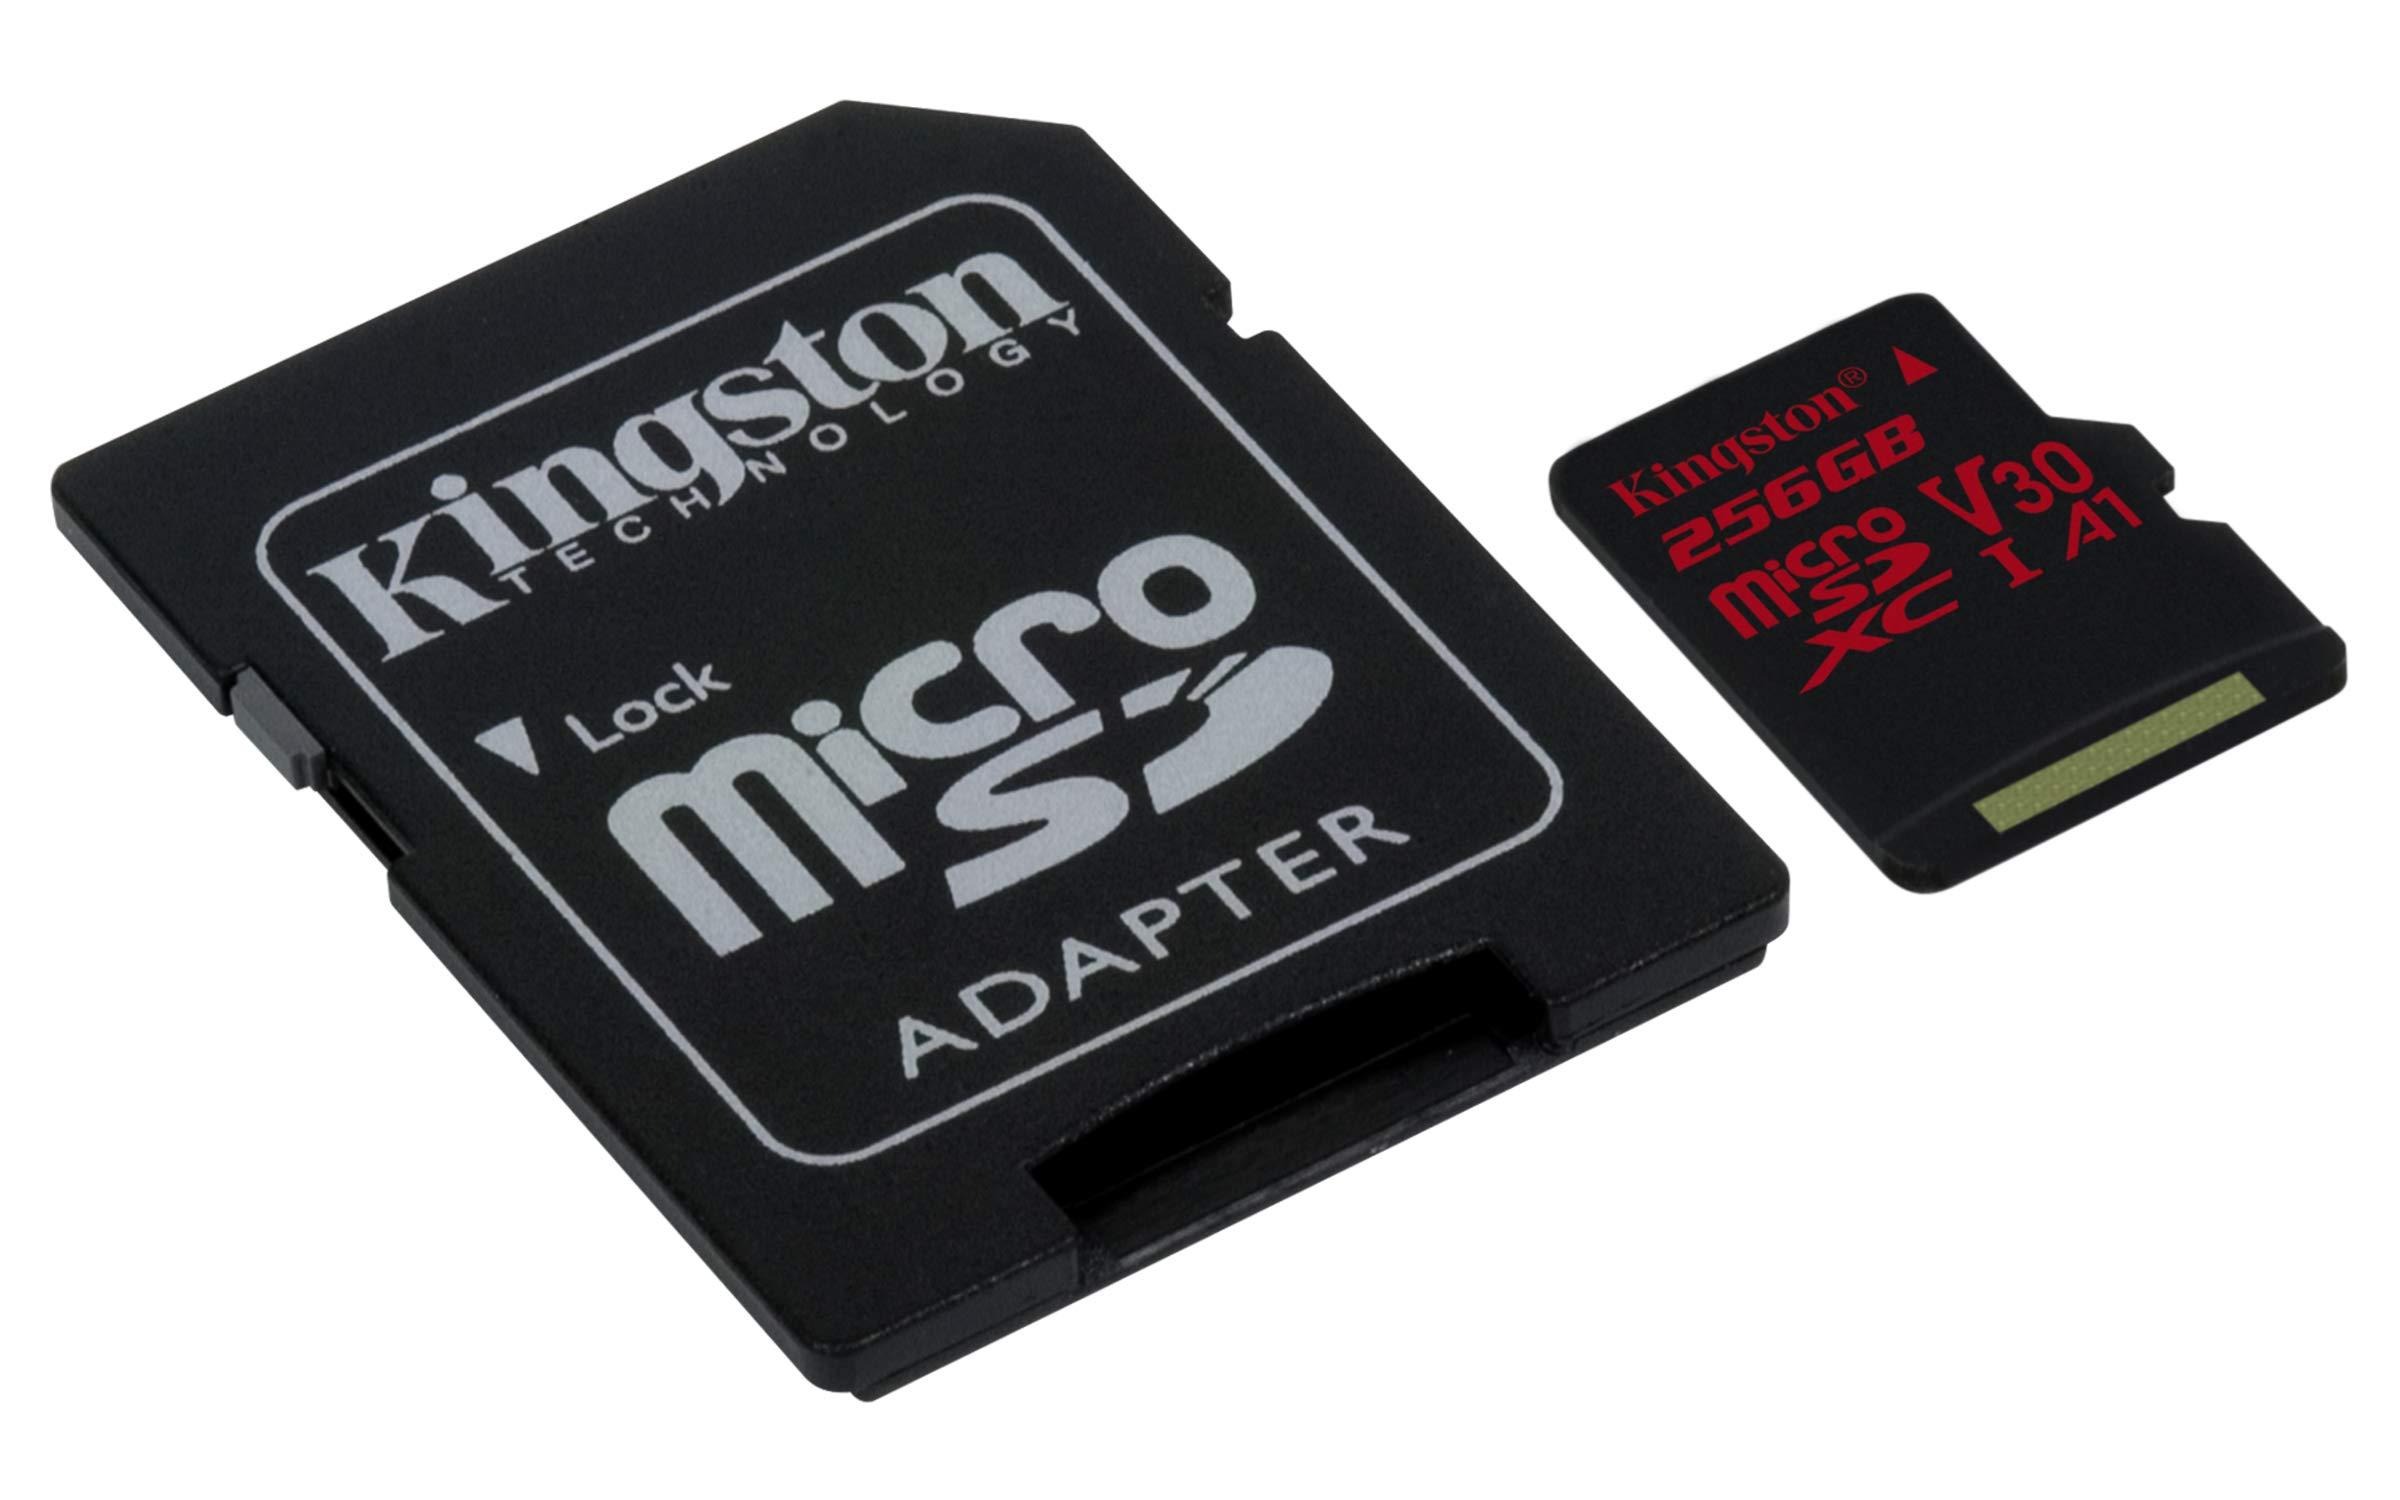 Kingston Digital SDCR/256GB Canvas React 256GB microSDXC Class 10 microSD Memory Card UHS-I 100MB/s R Flash Memory High Speed microSD Card with Adapter by Kingston